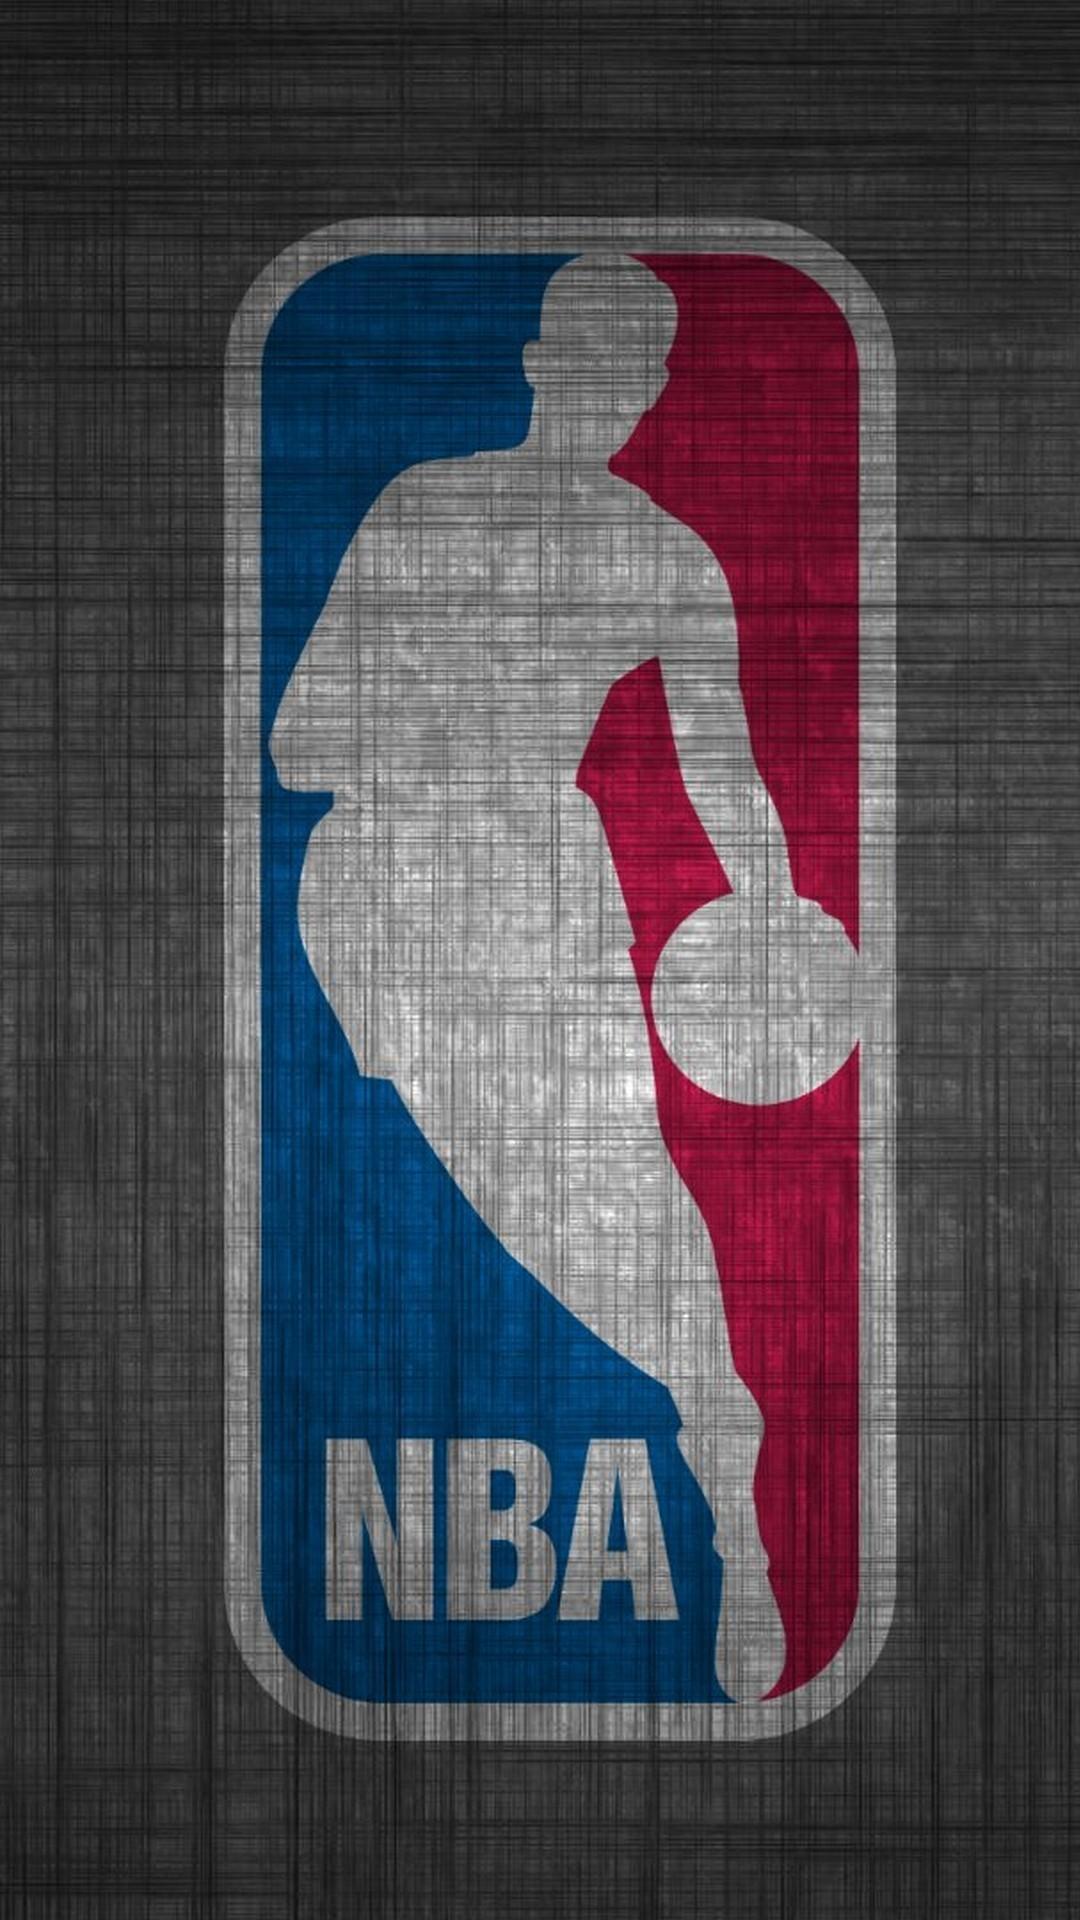 NBA Wallpaper Mobile 2020 Basketball Wallpaper 1080x1920